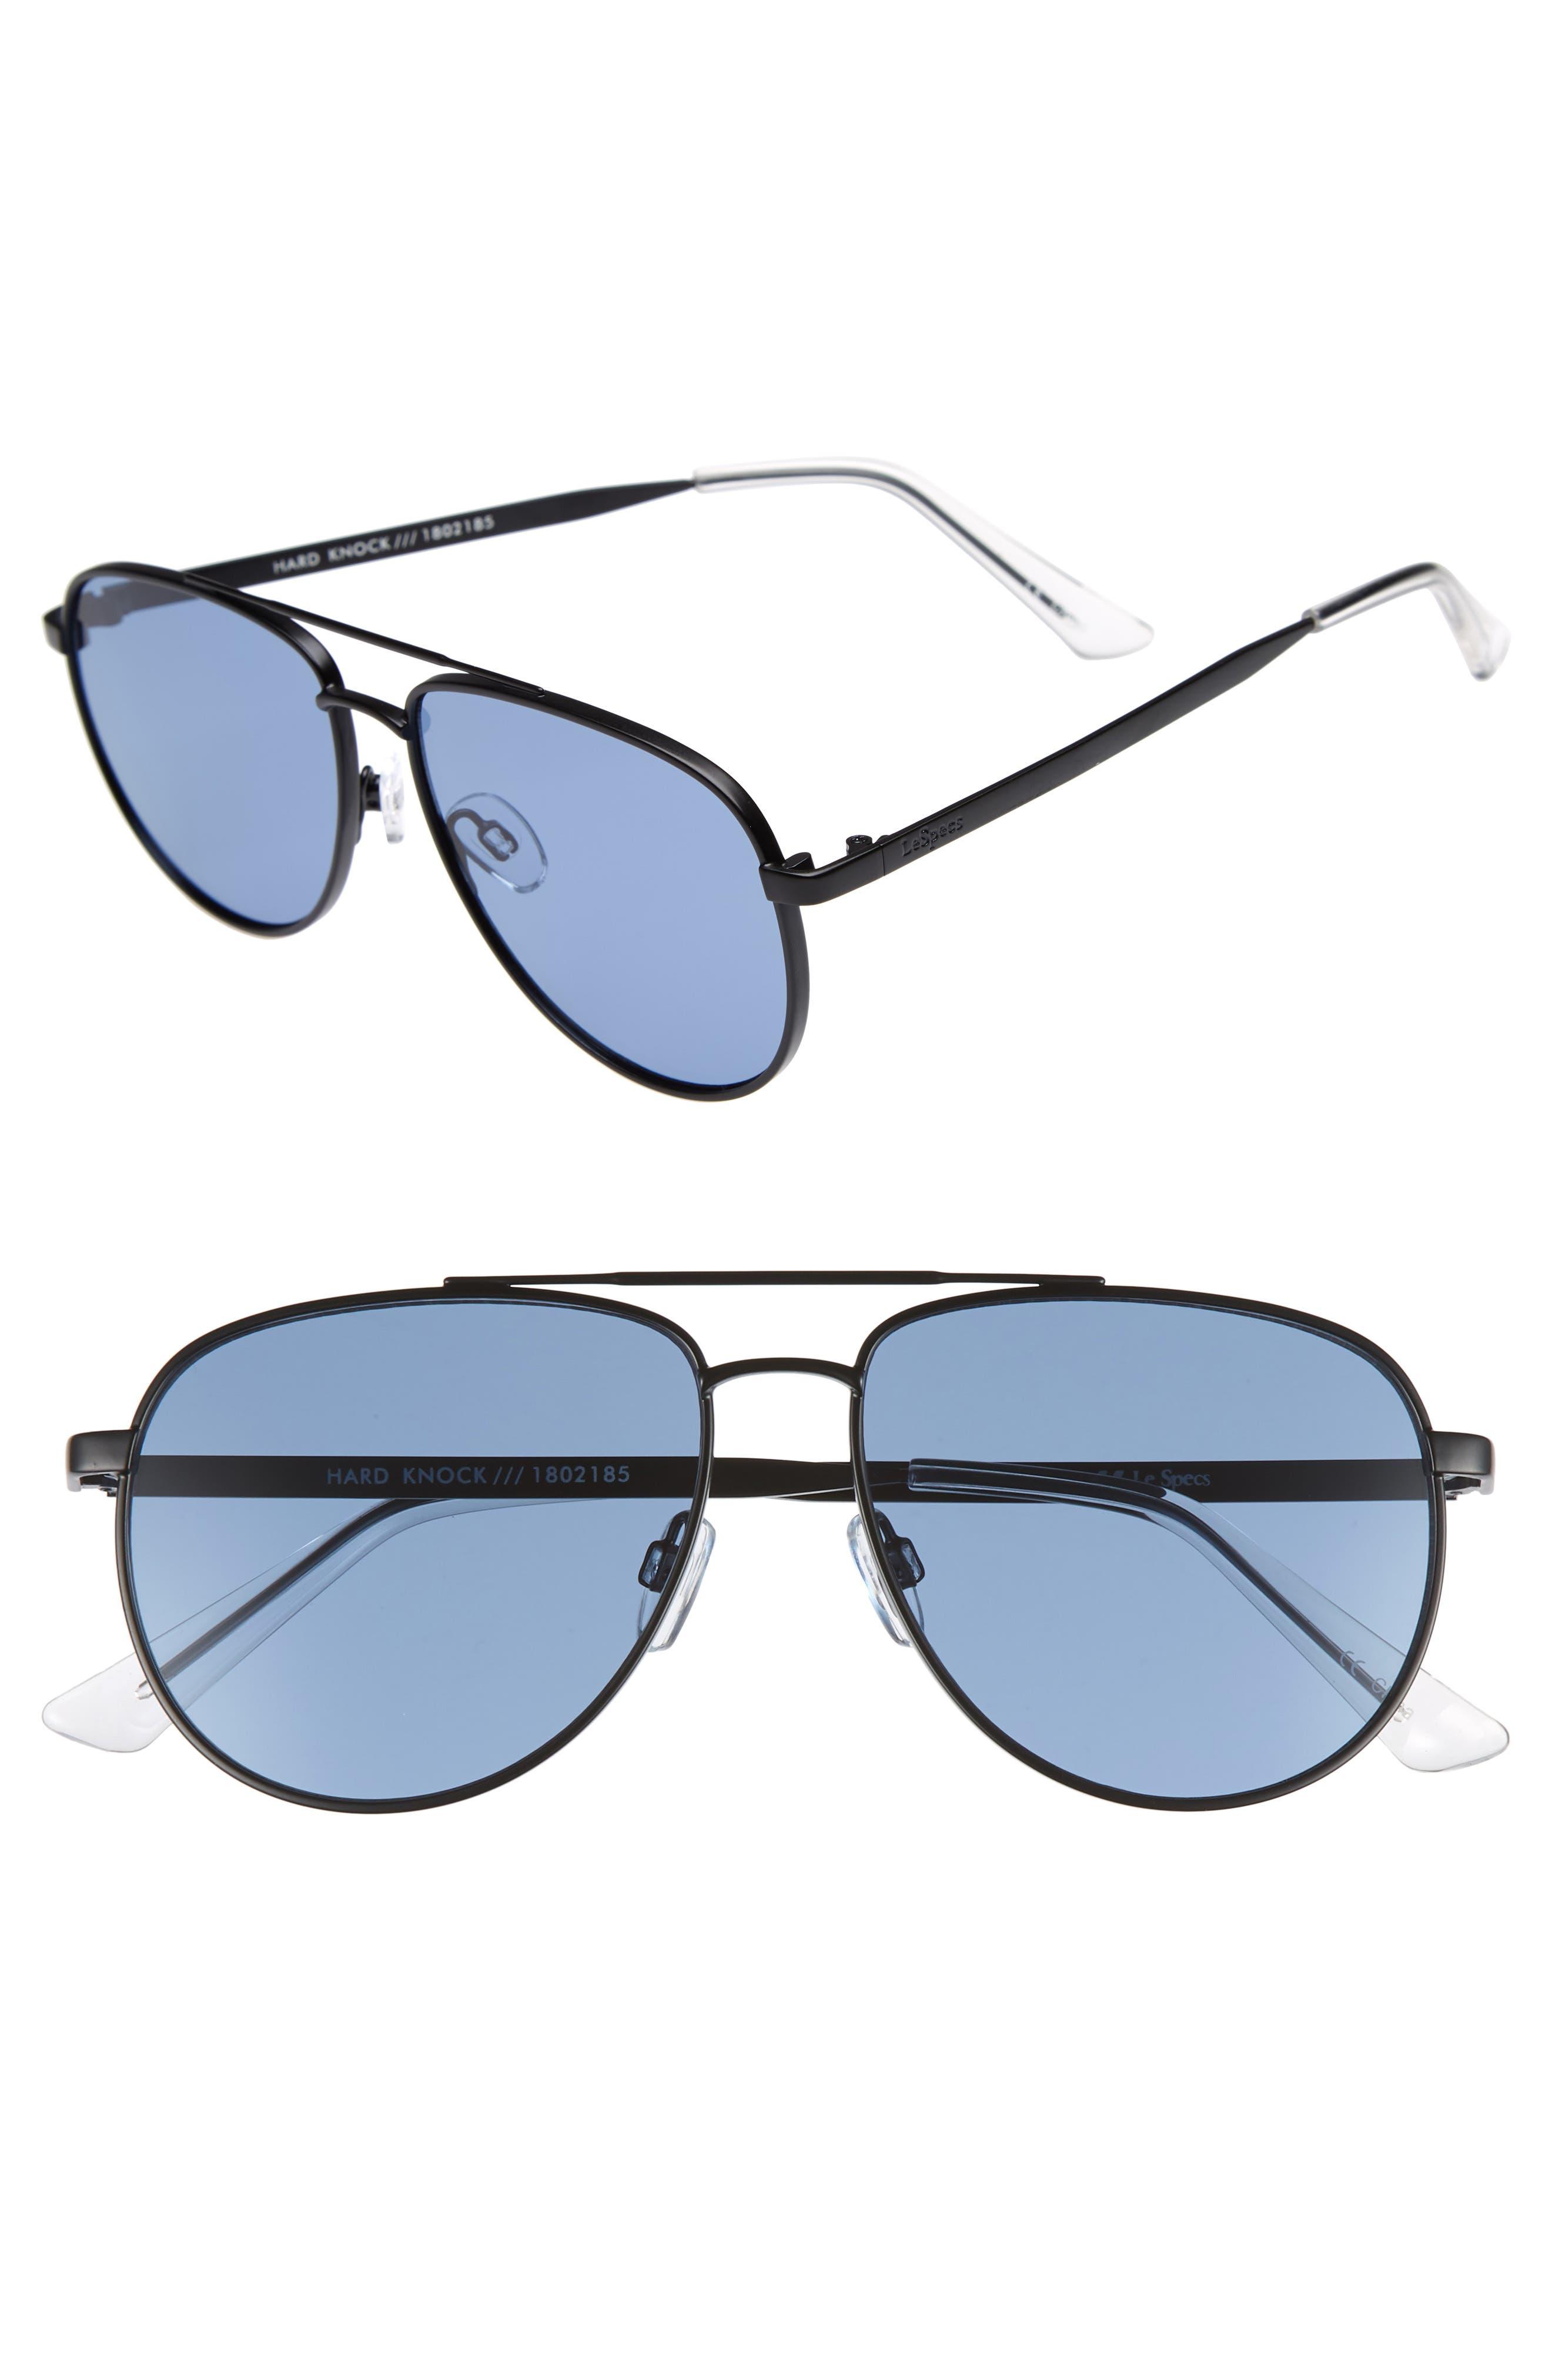 Hard Knock 57mm Aviator Sunglasses,                             Main thumbnail 1, color,                             Matte Navy